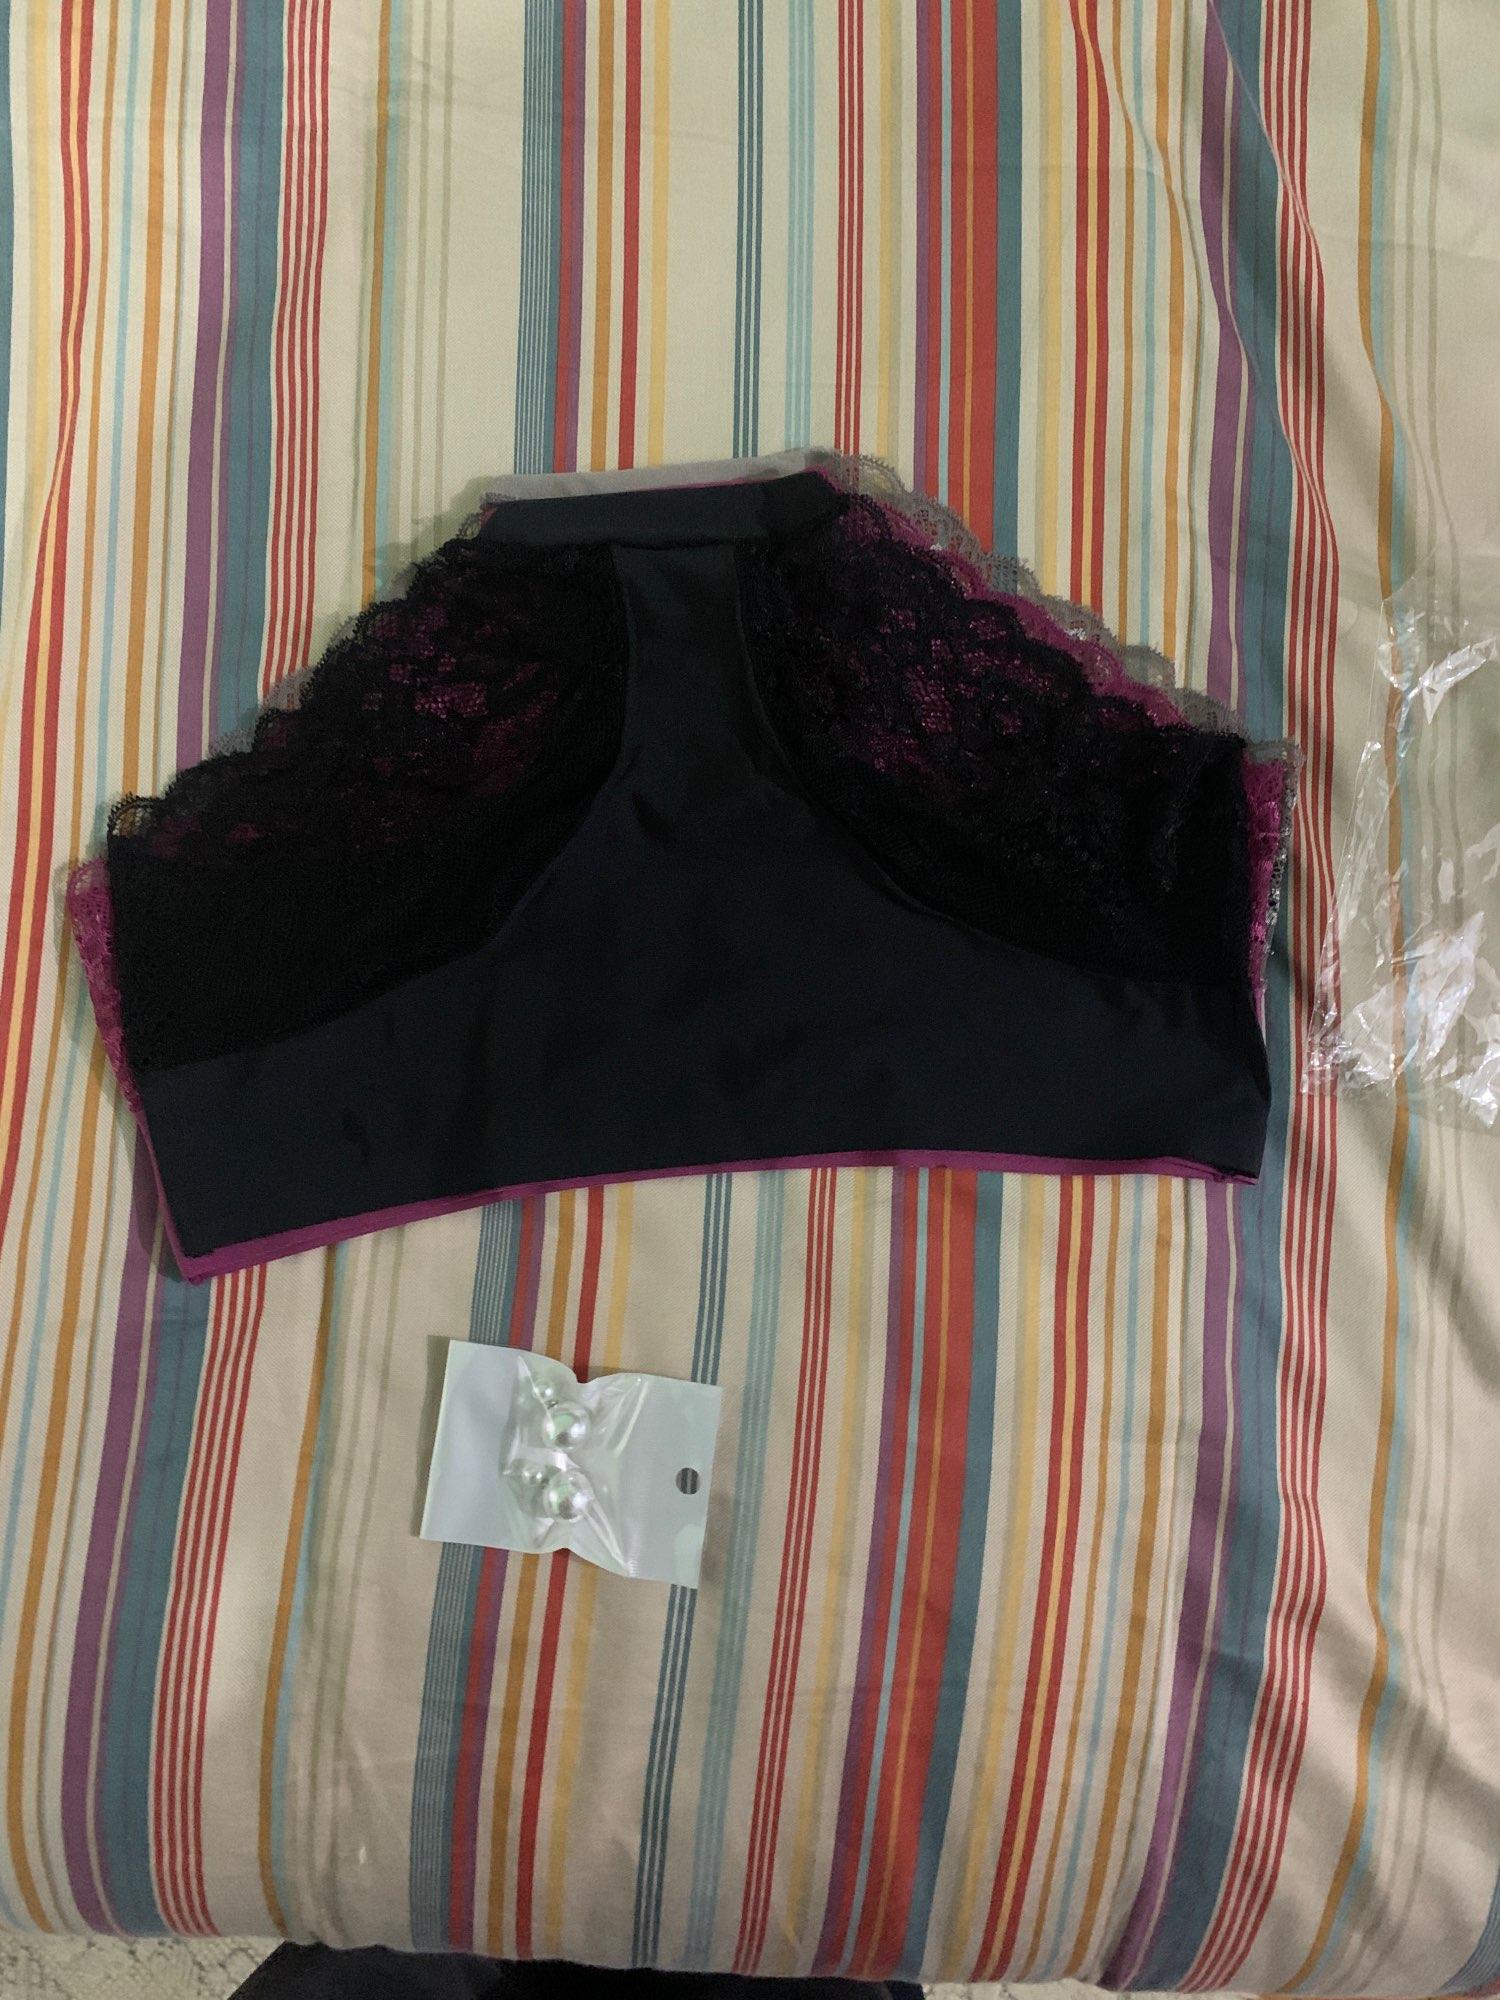 ALLMIX 3Pcs/lot Hollow Out Women's Seamless Panties Set Underwear Lace Woman Sport Briefs Low Waist Silk Comfort Lady Lingerie photo review